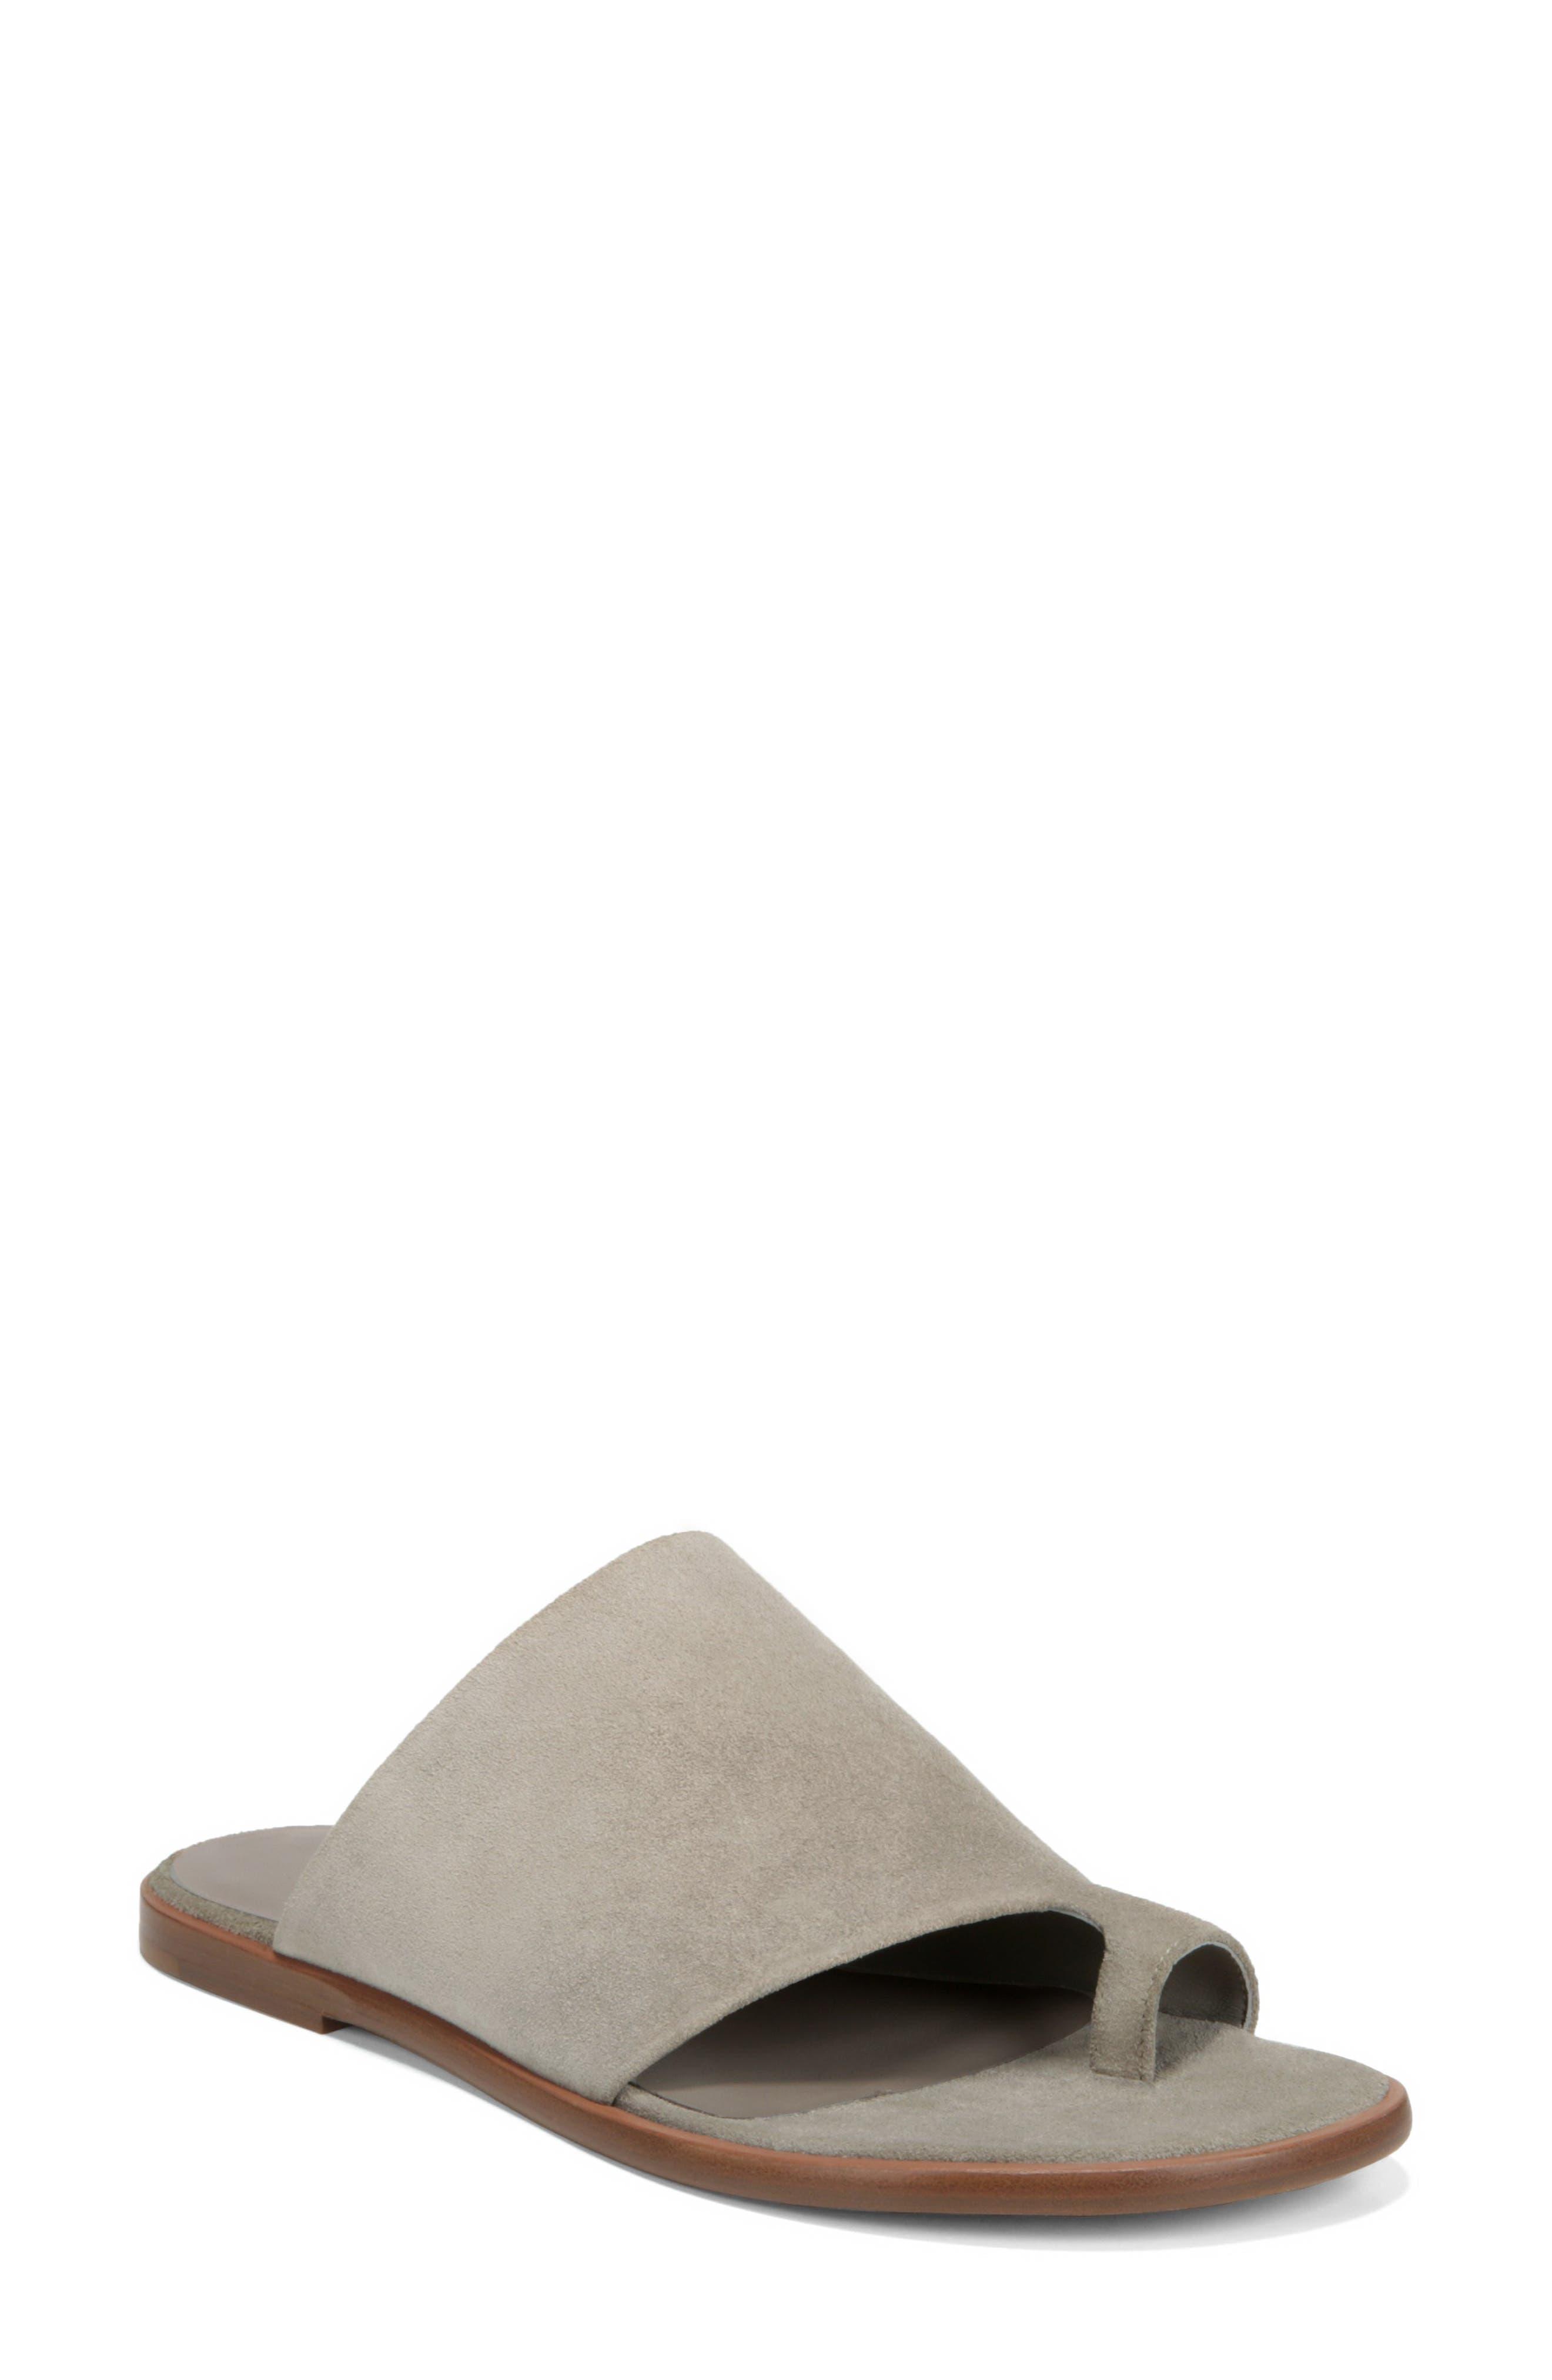 VINCE Edris Toe Loop Sandal, Main, color, LIGHT WOODSMOKE